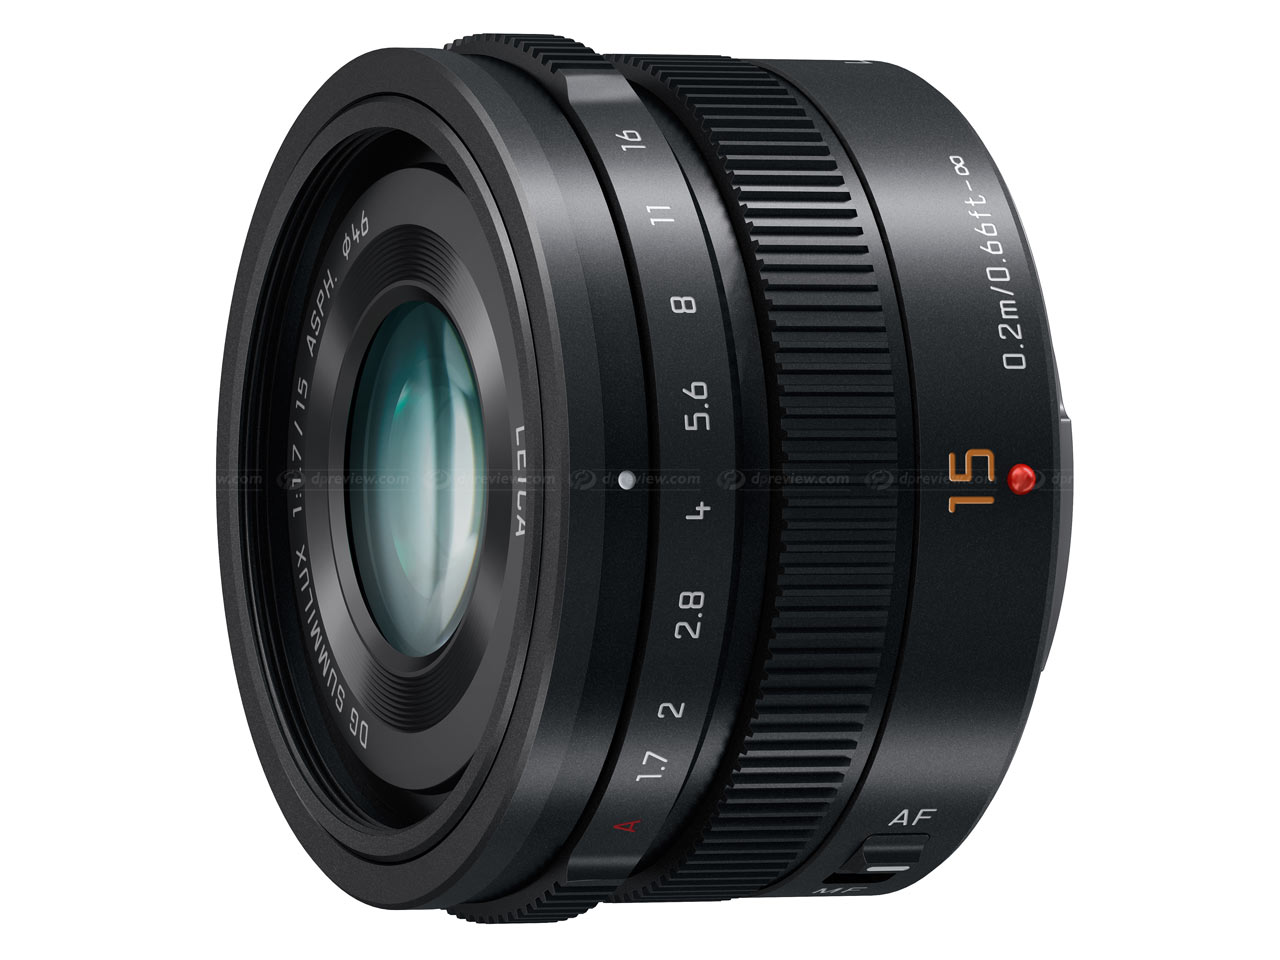 Leica_DG_Summilux_15mm_F1.7_ASPH